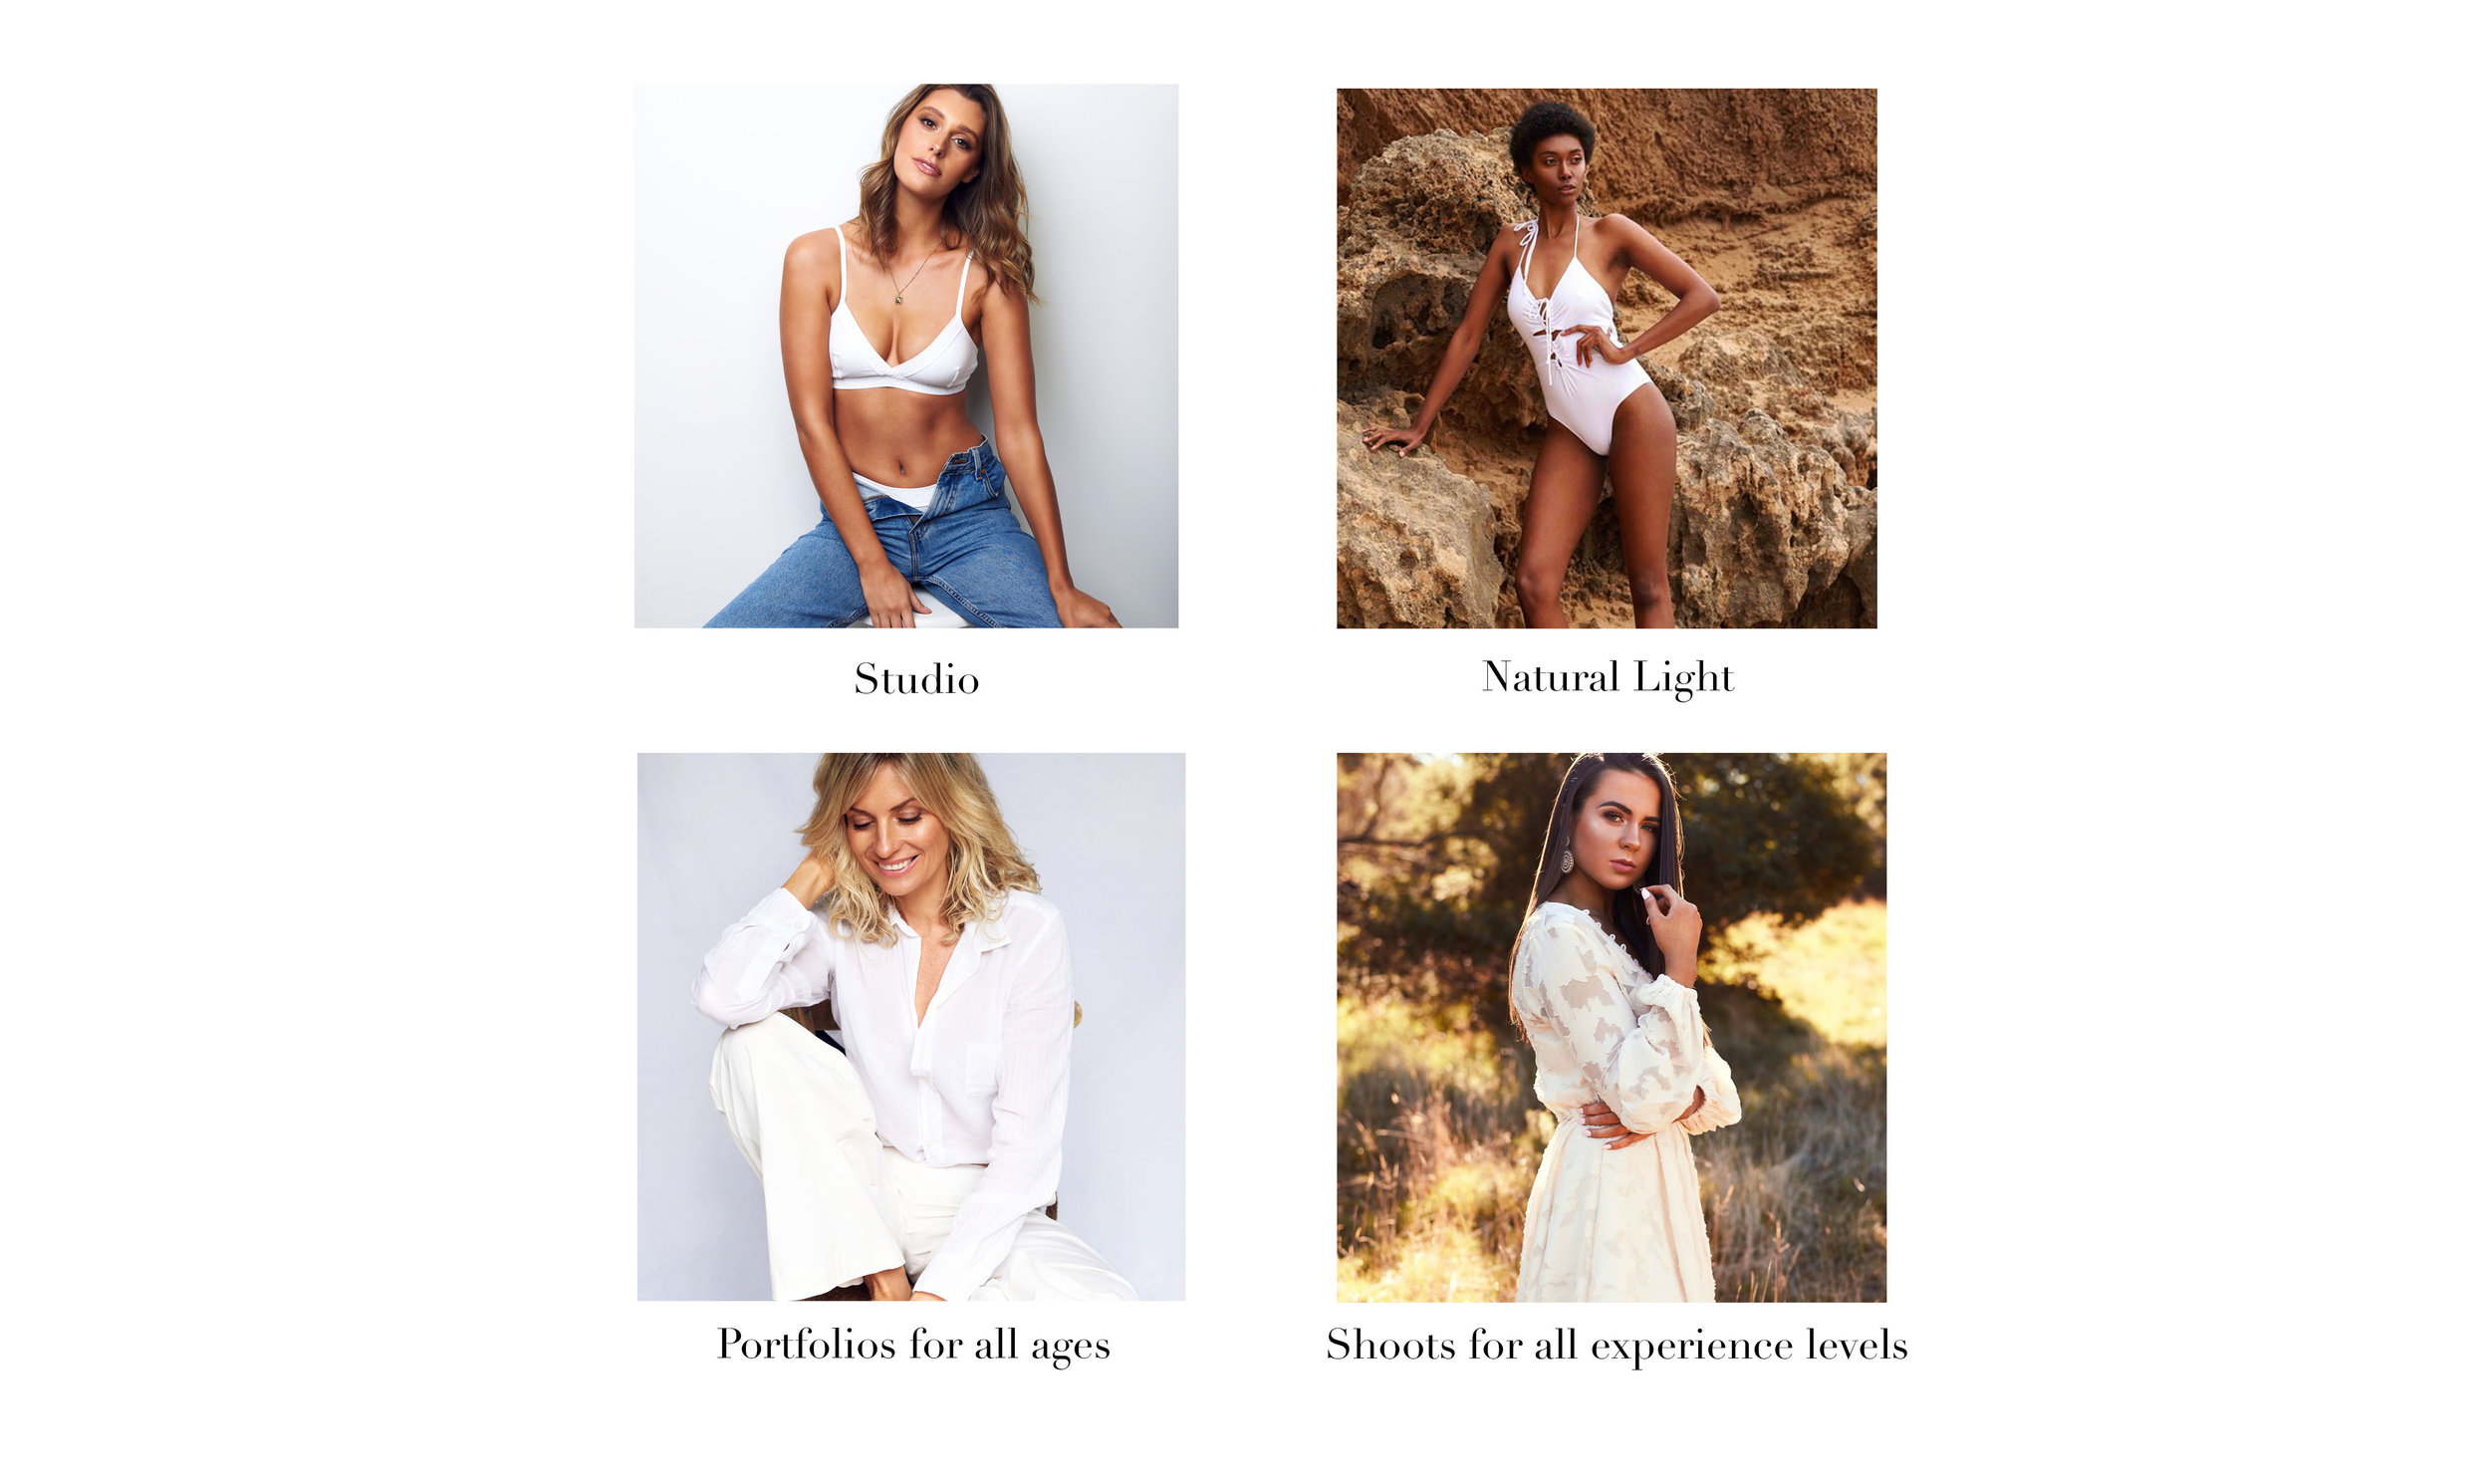 melbourne-model-portfolio-photographer-marissa-alden.jpg